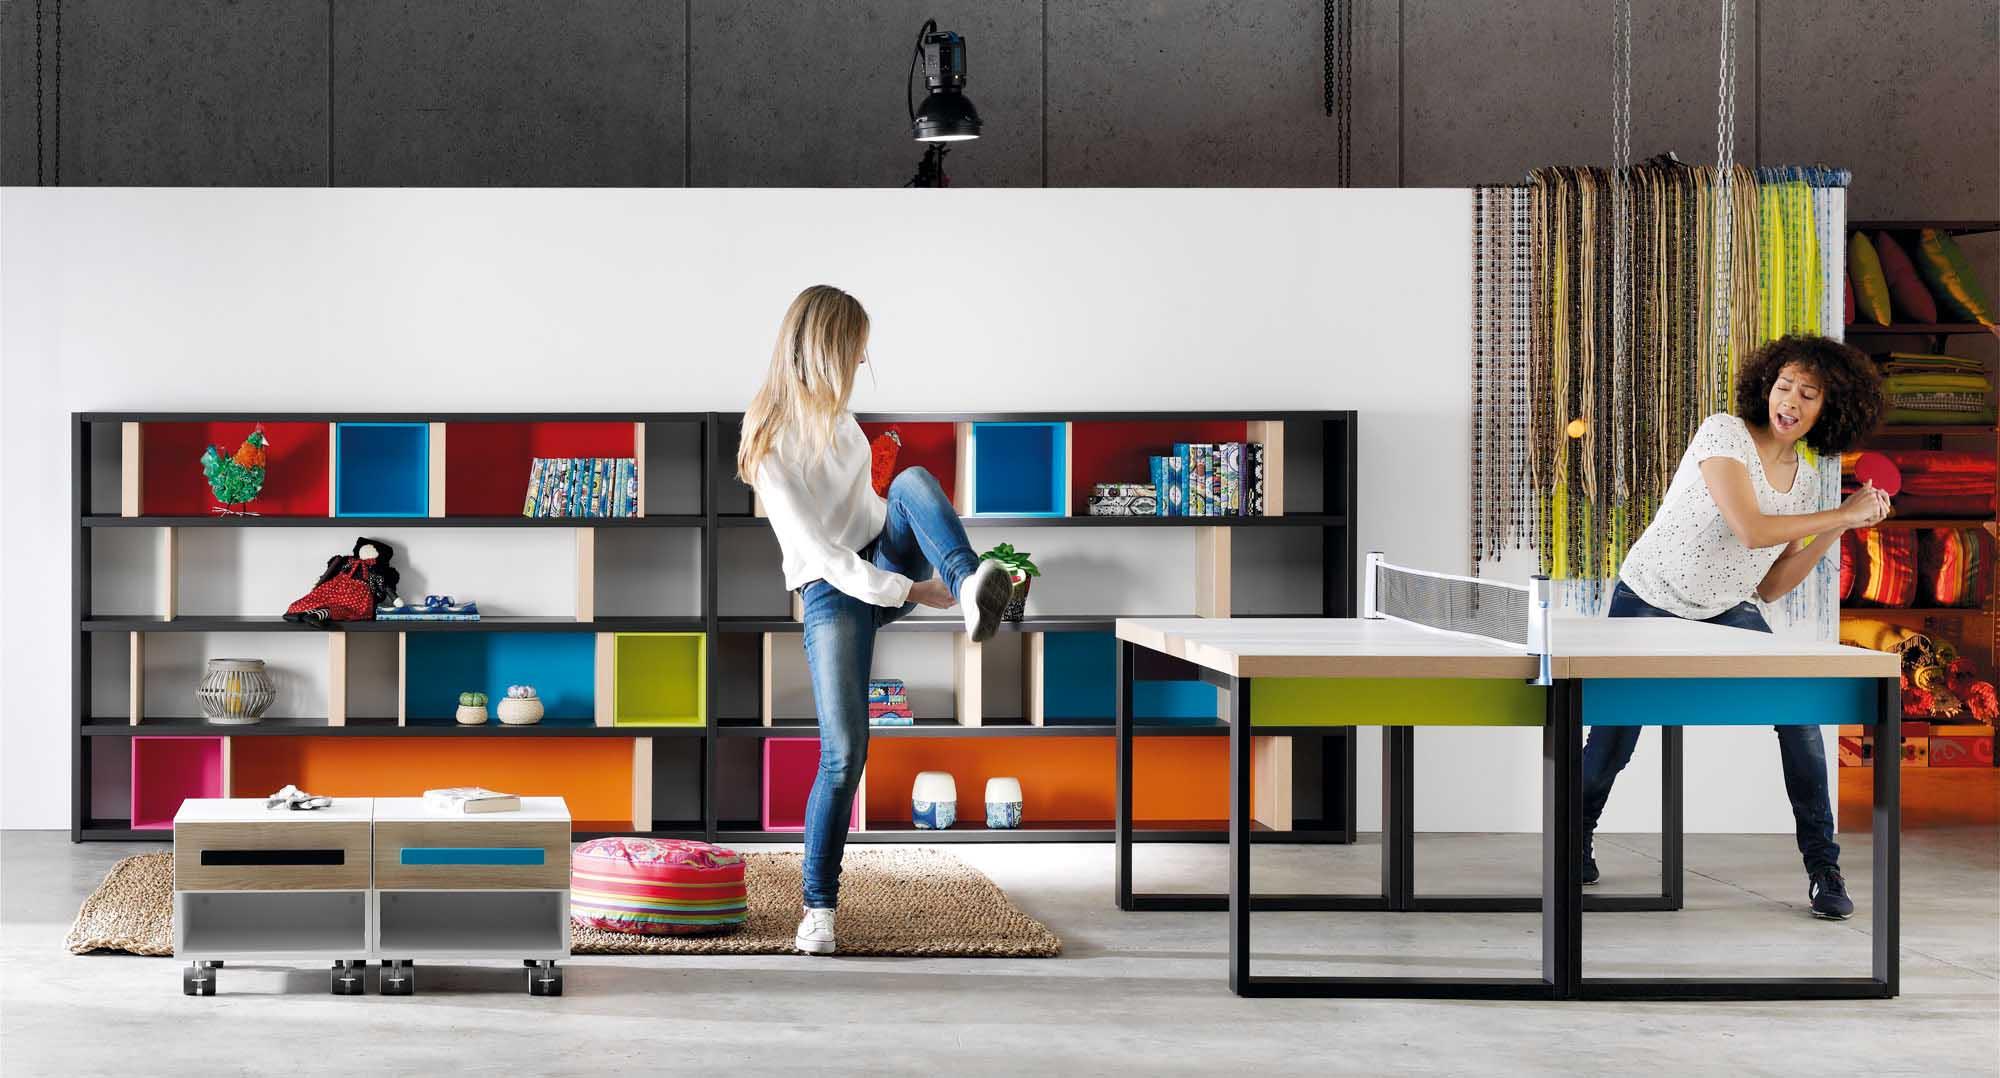 Tatat mobles a mida i m s experts en moble juvenil zona for Decoracion despachos juveniles